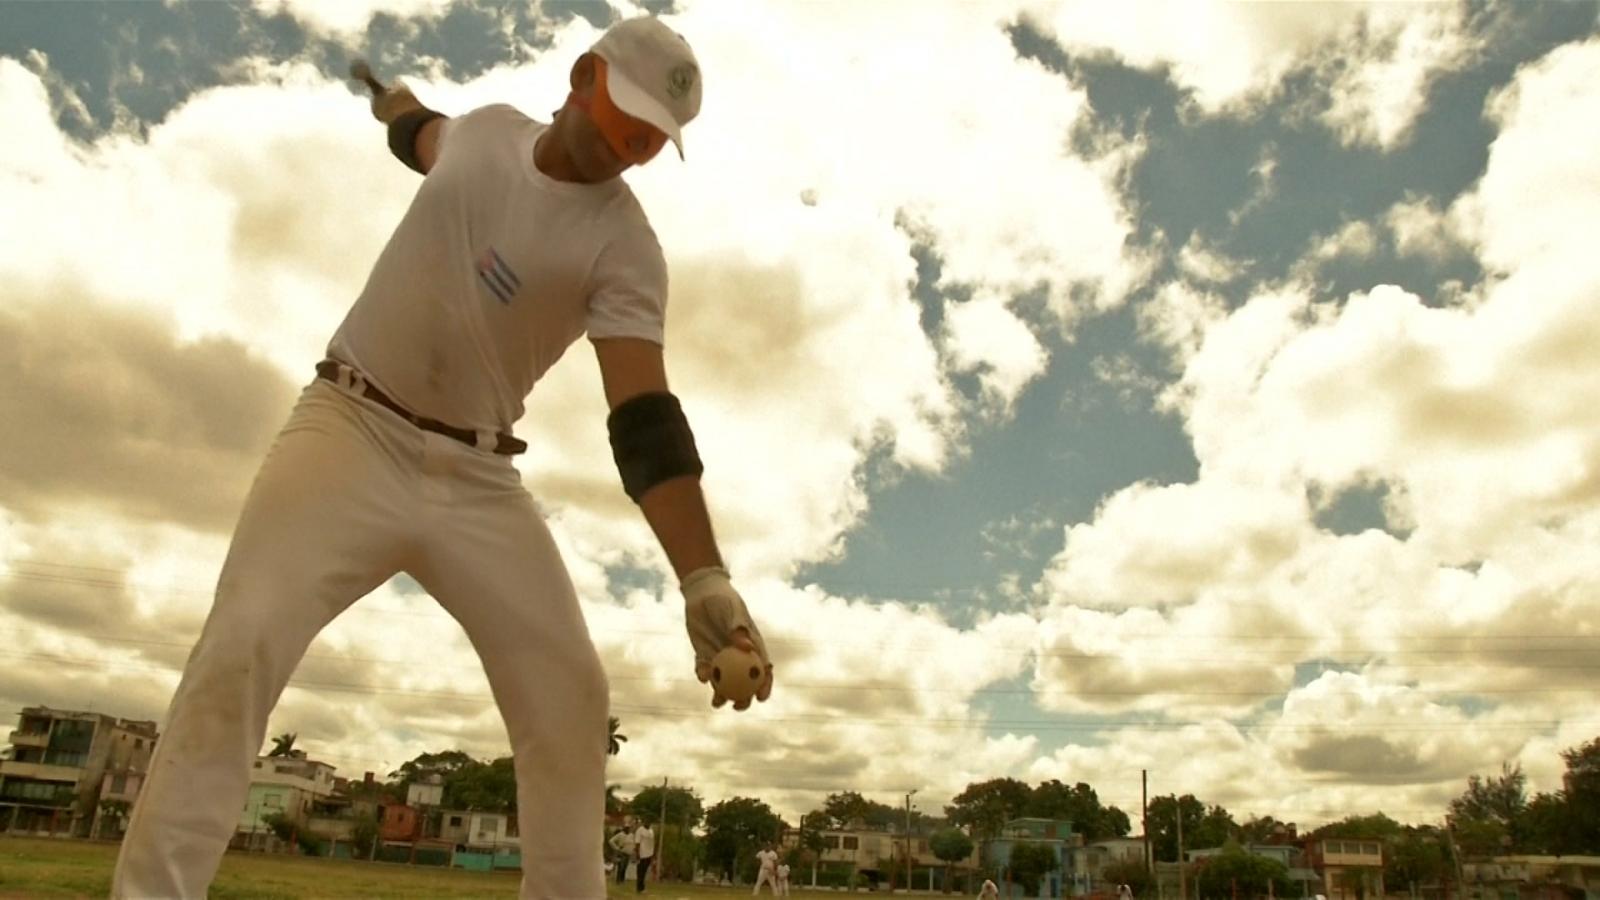 blind-baseball-is-taking-cuba-by-storm